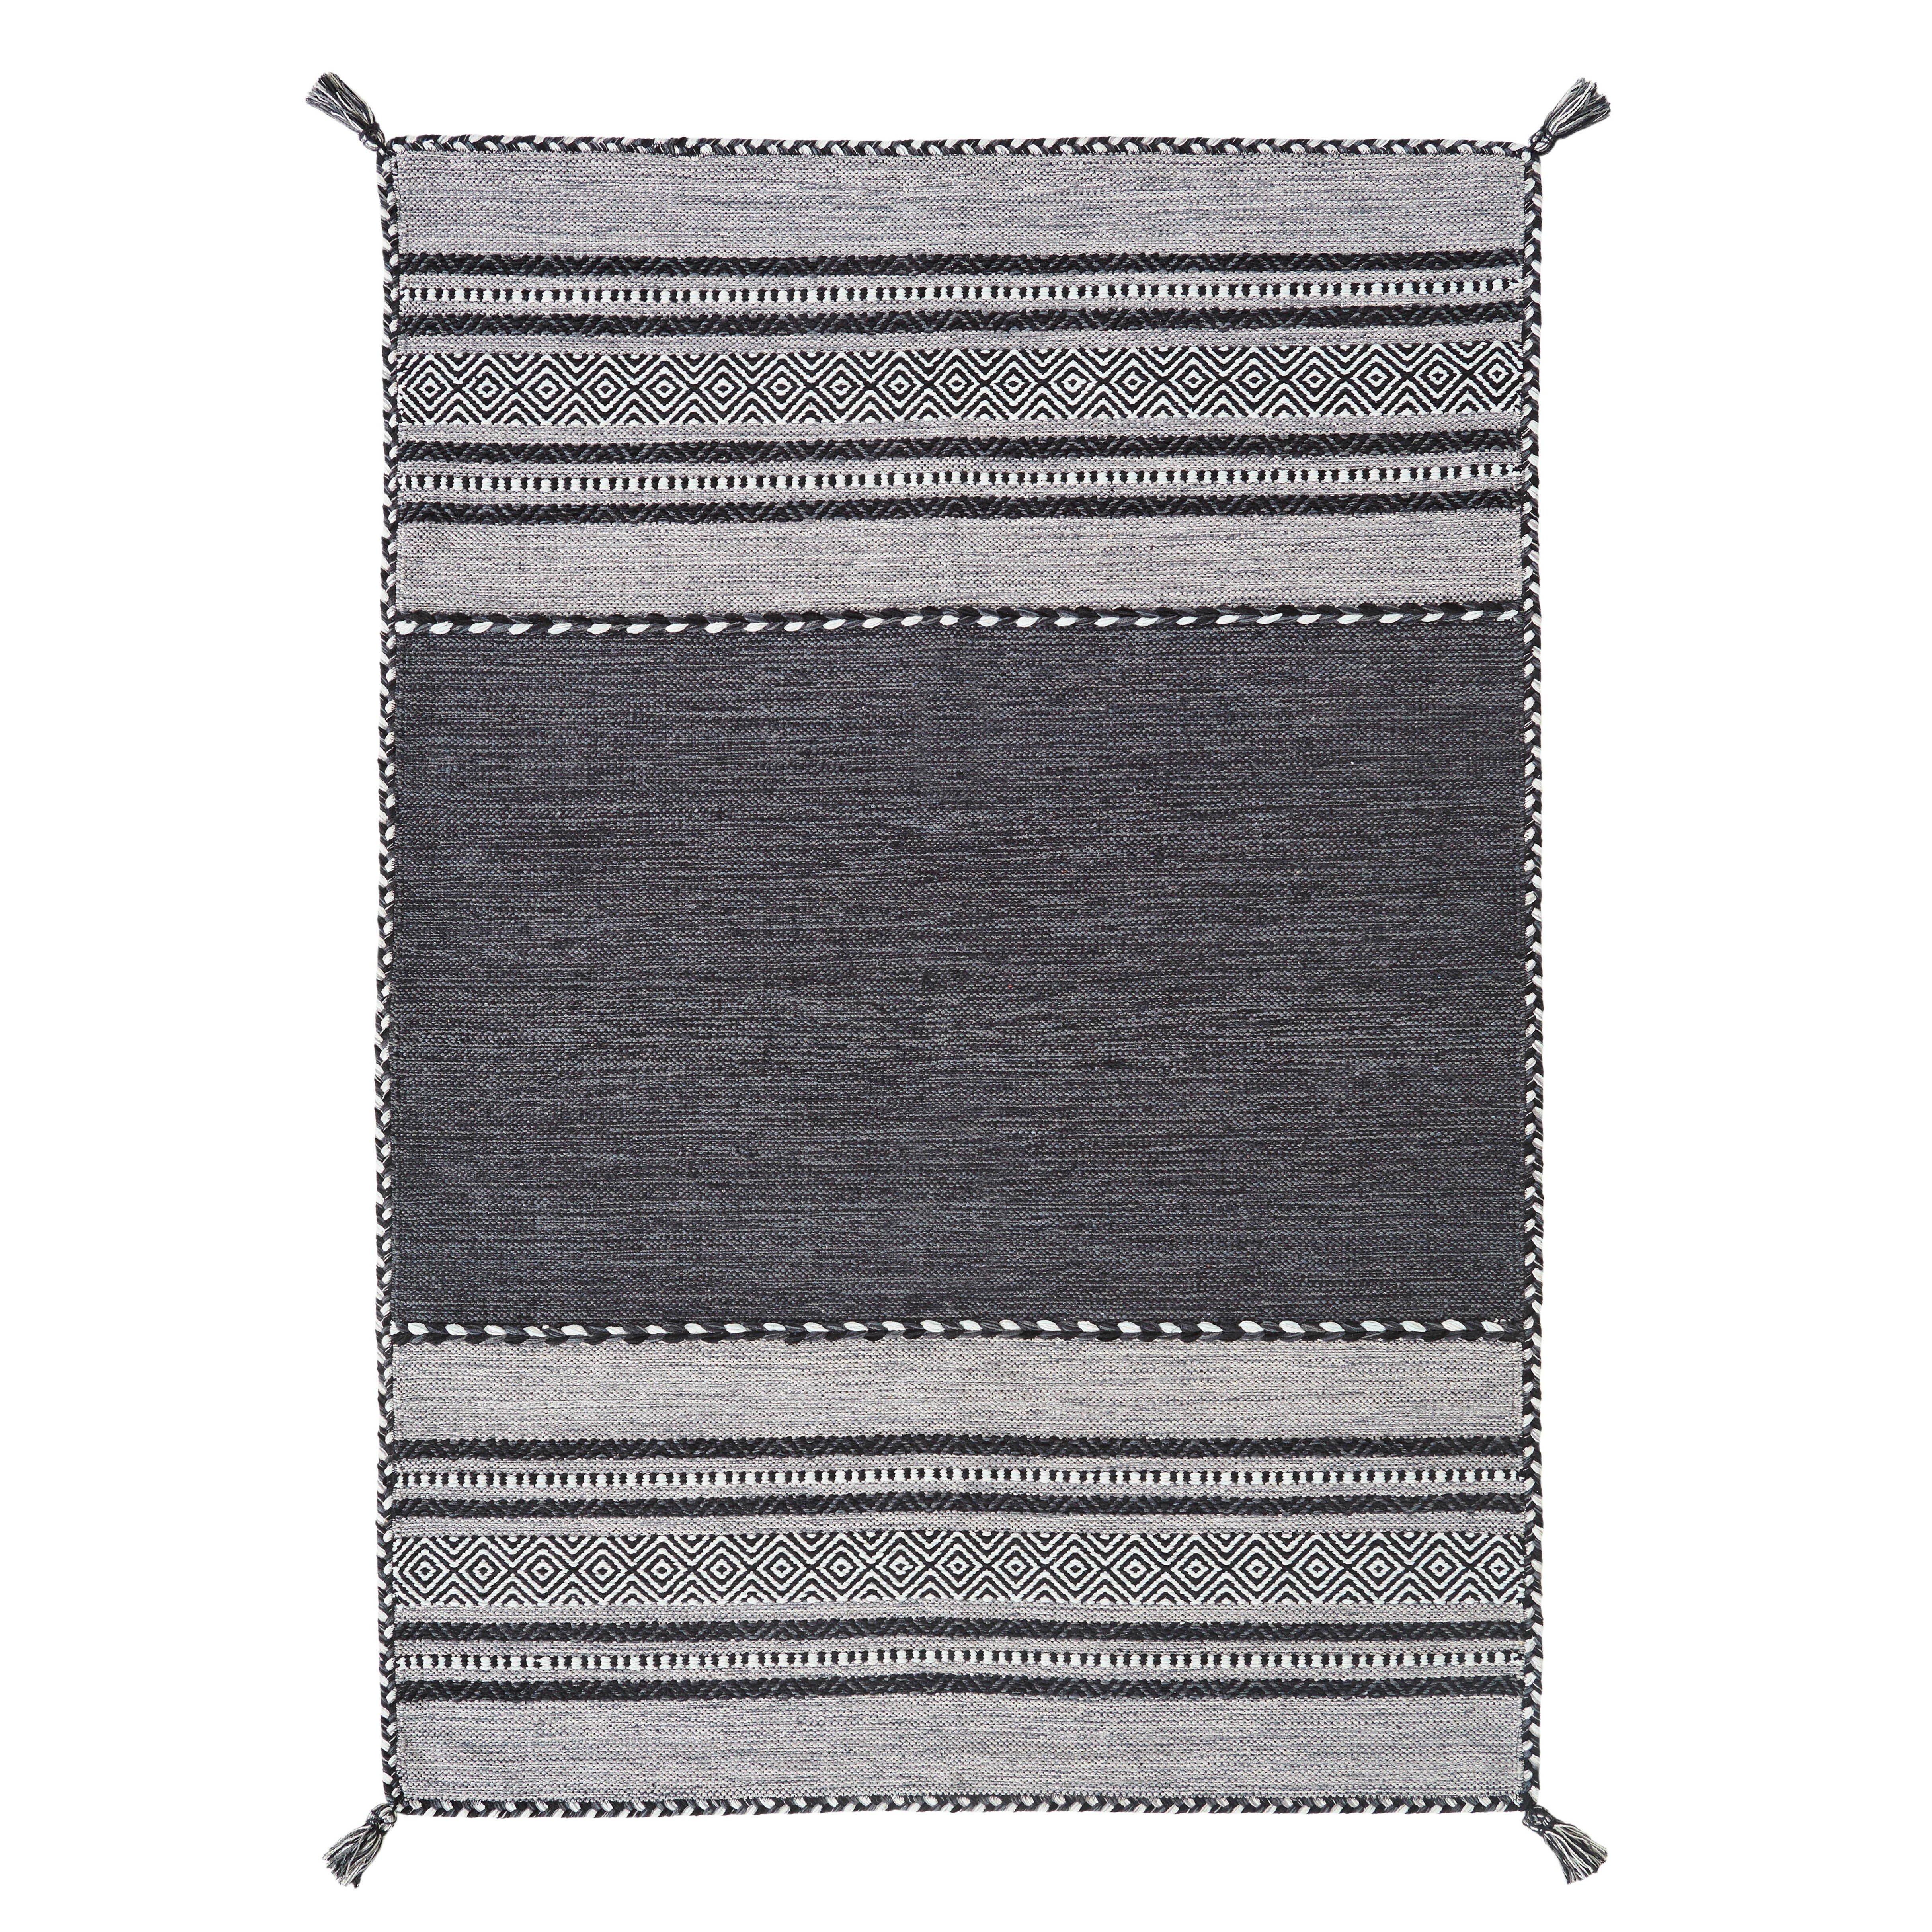 Brook Lane Rugs Handgewebter Teppich Kelim in Anthrazit